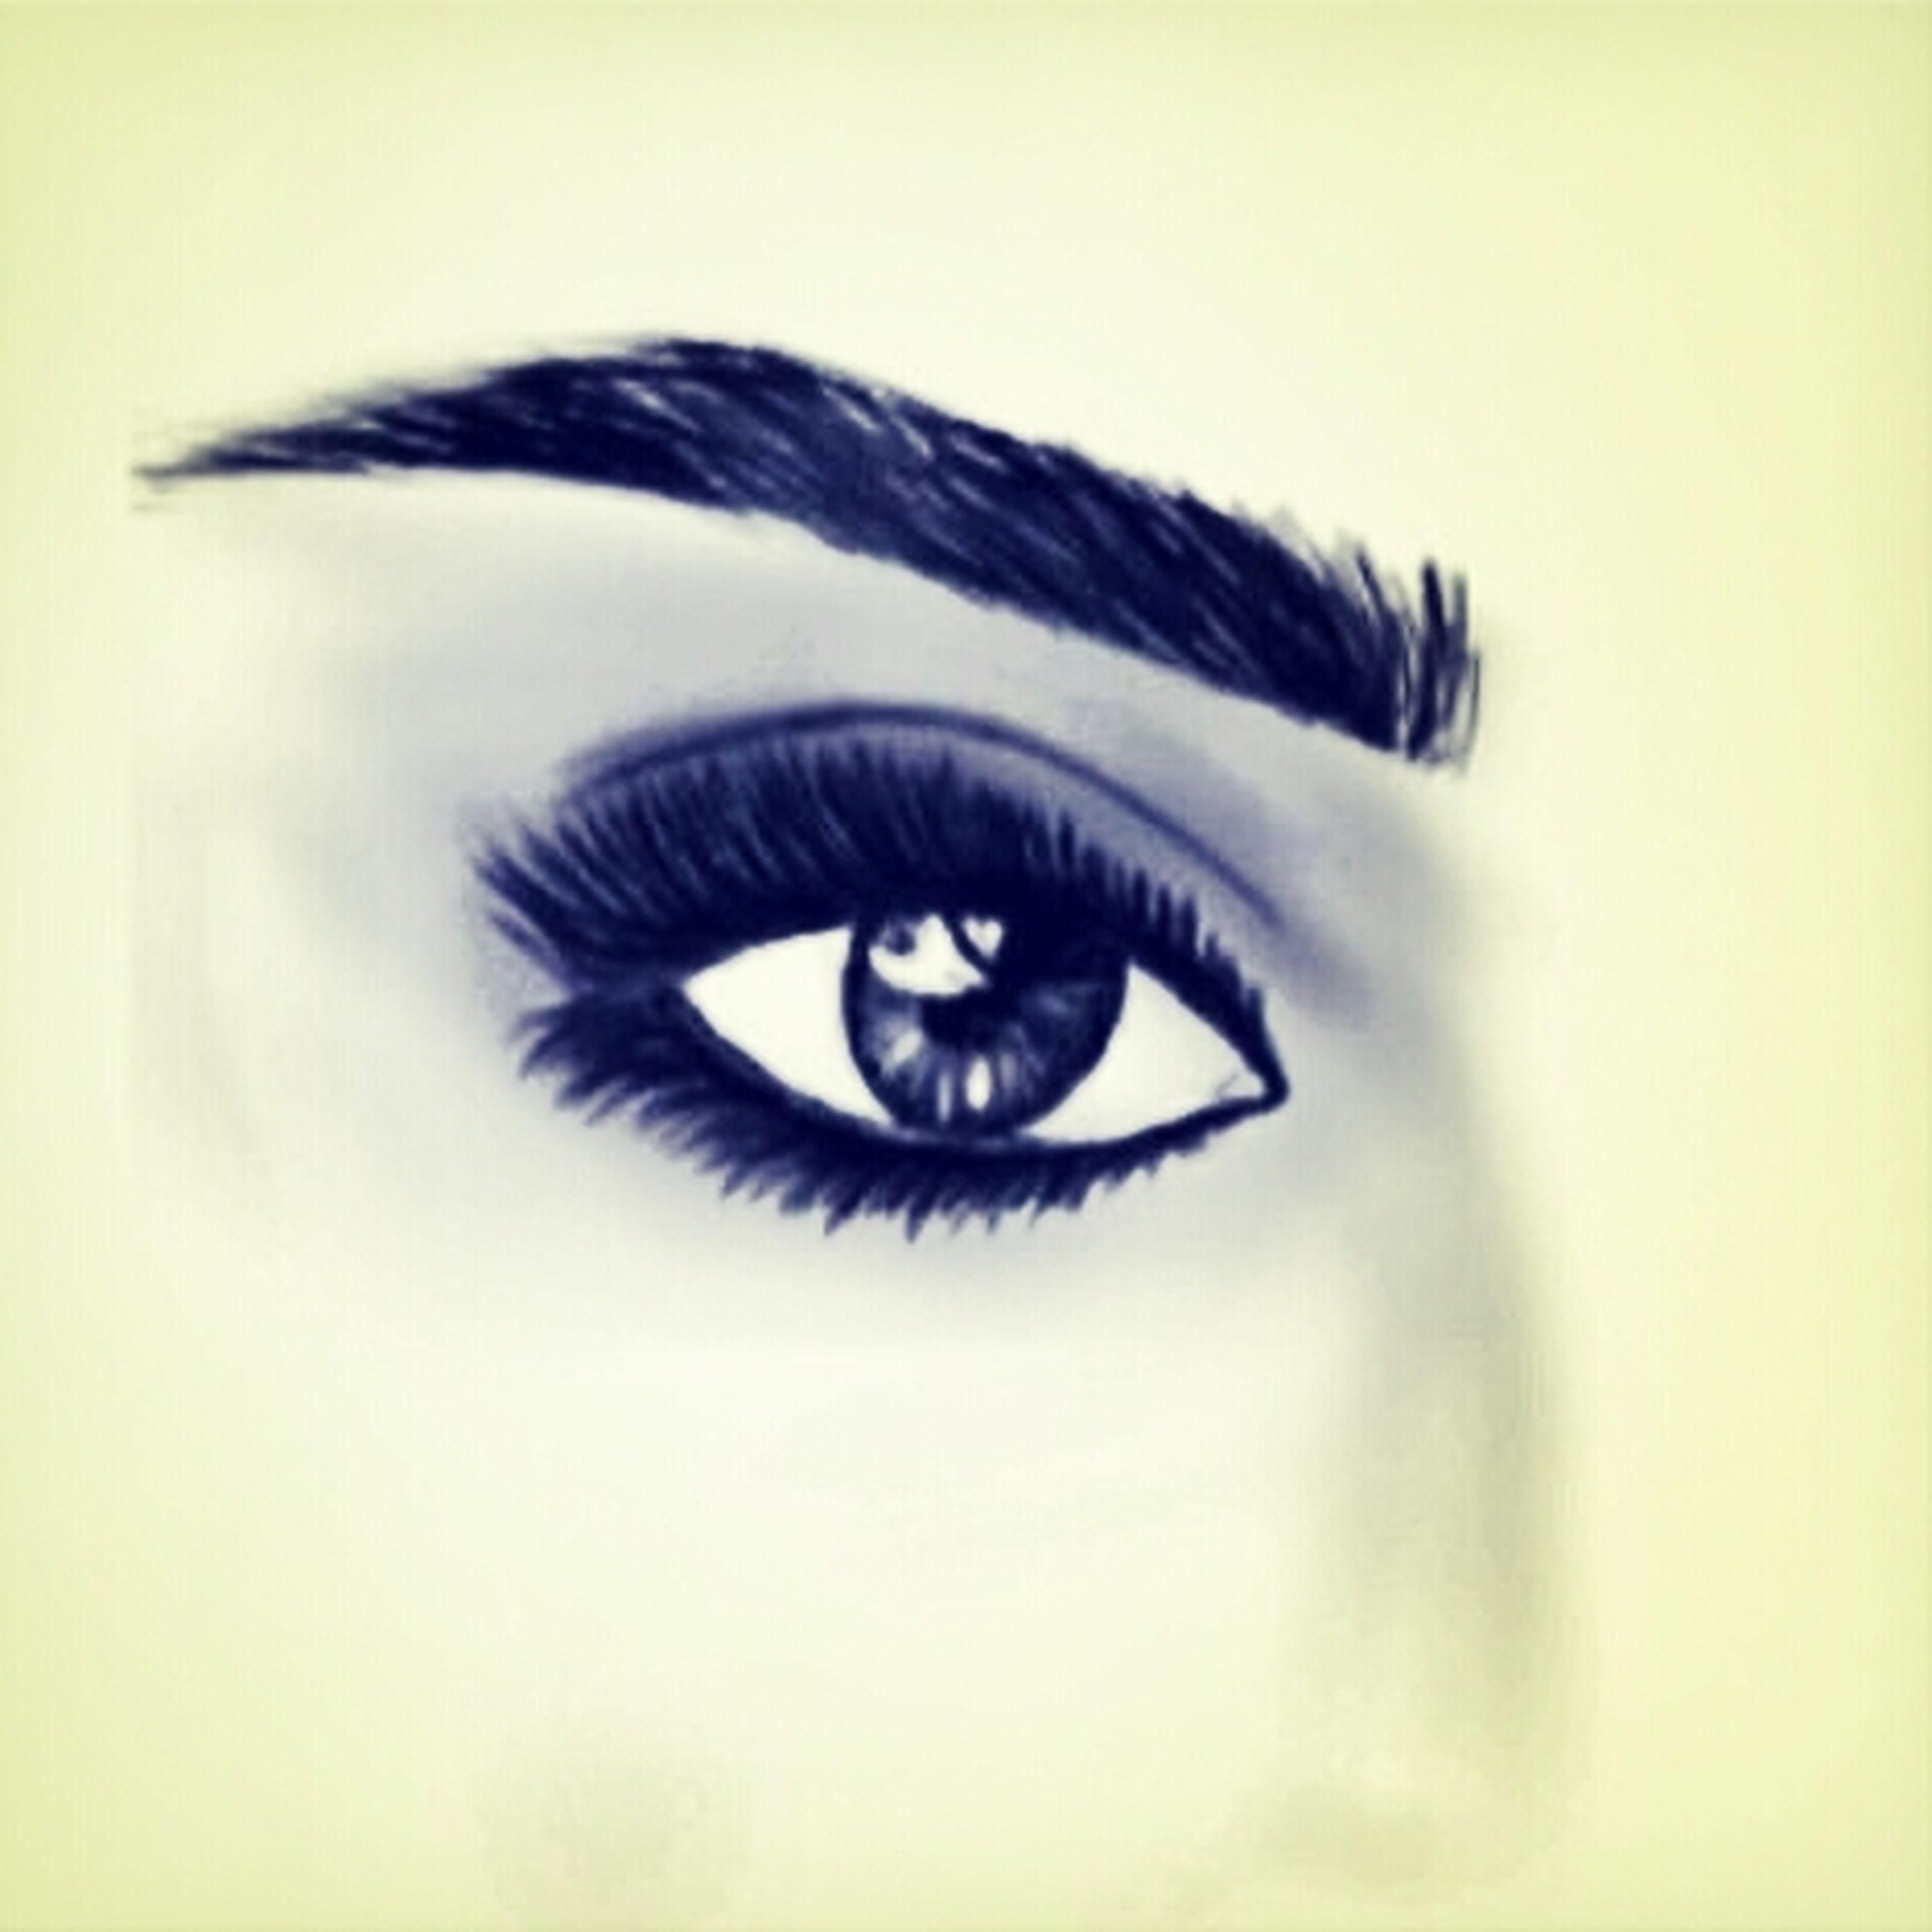 close-up, studio shot, human eye, white background, eyelash, sensory perception, eyesight, extreme close-up, part of, human skin, human face, looking at camera, portrait, indoors, iris - eye, eyeball, detail